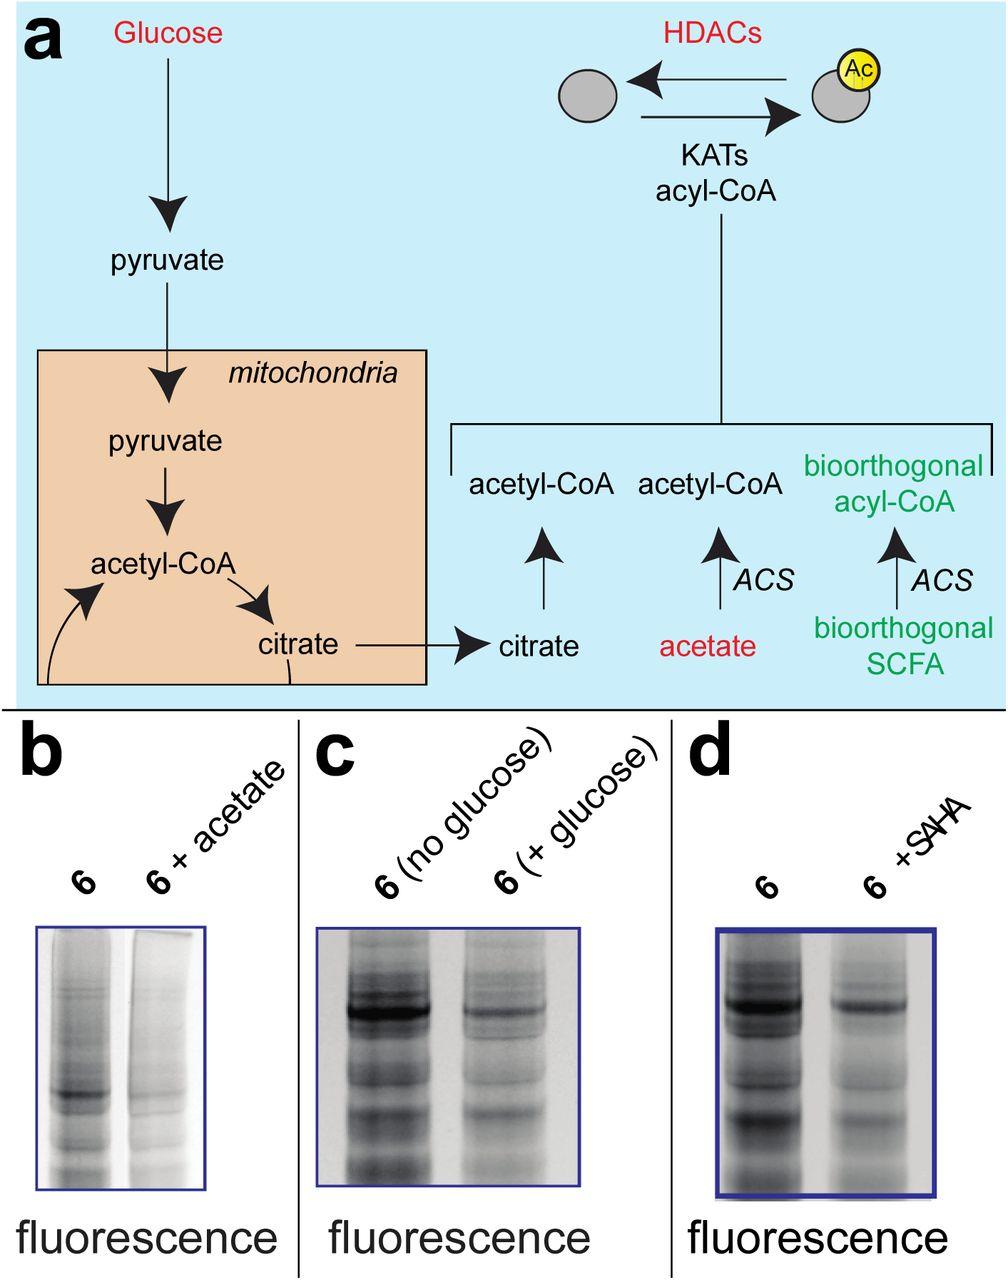 Bioorthogonal pro-metabolites for profiling short chain